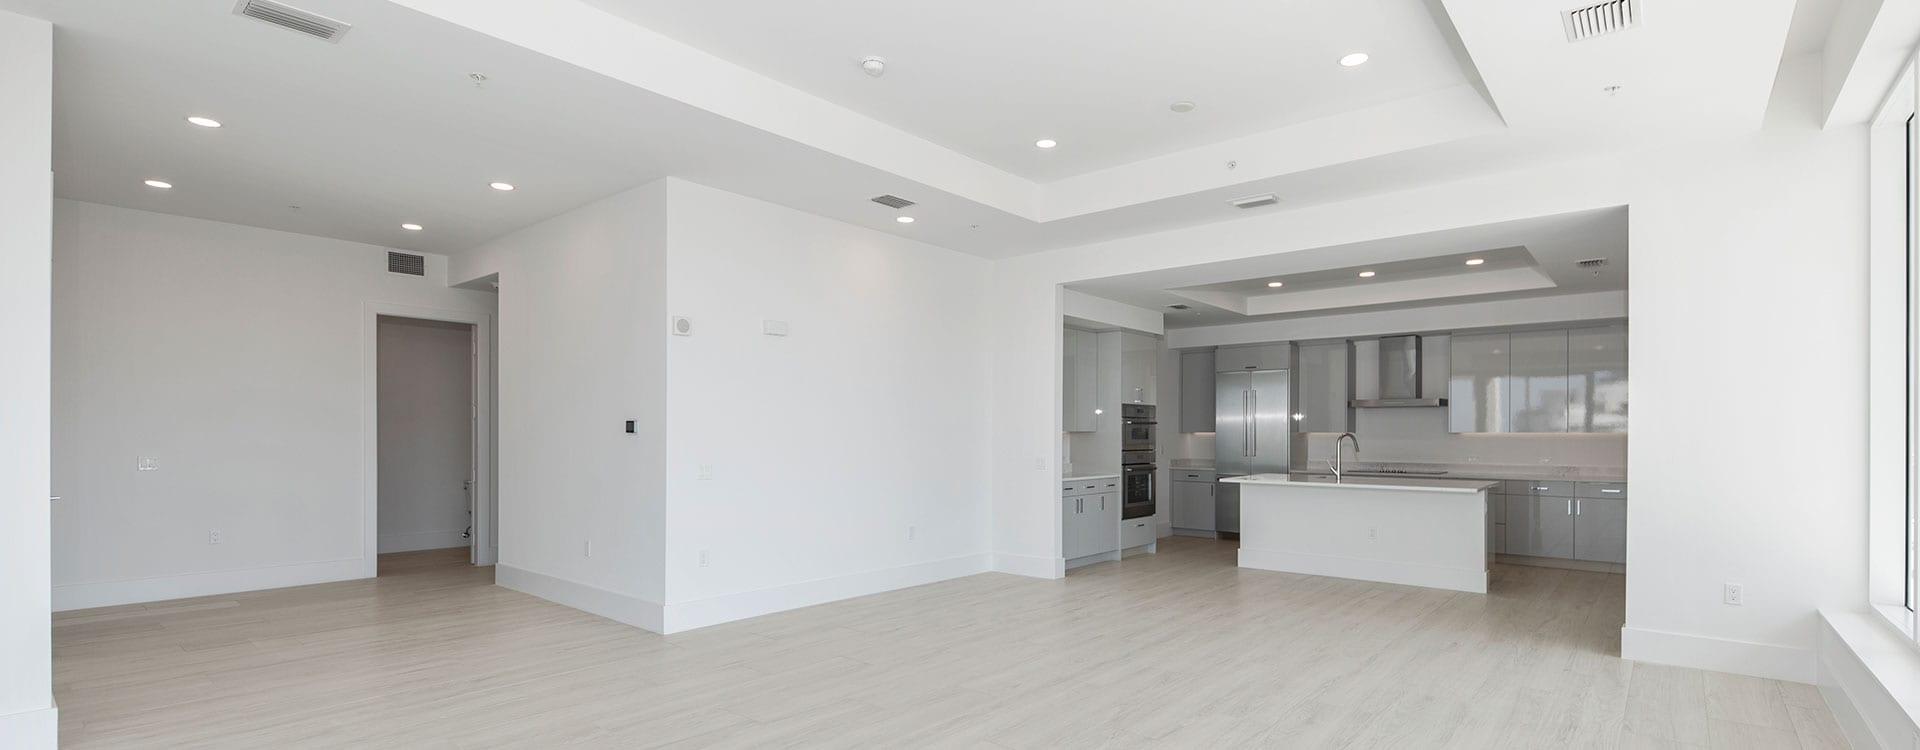 BLVD Residence 1204 Great Room